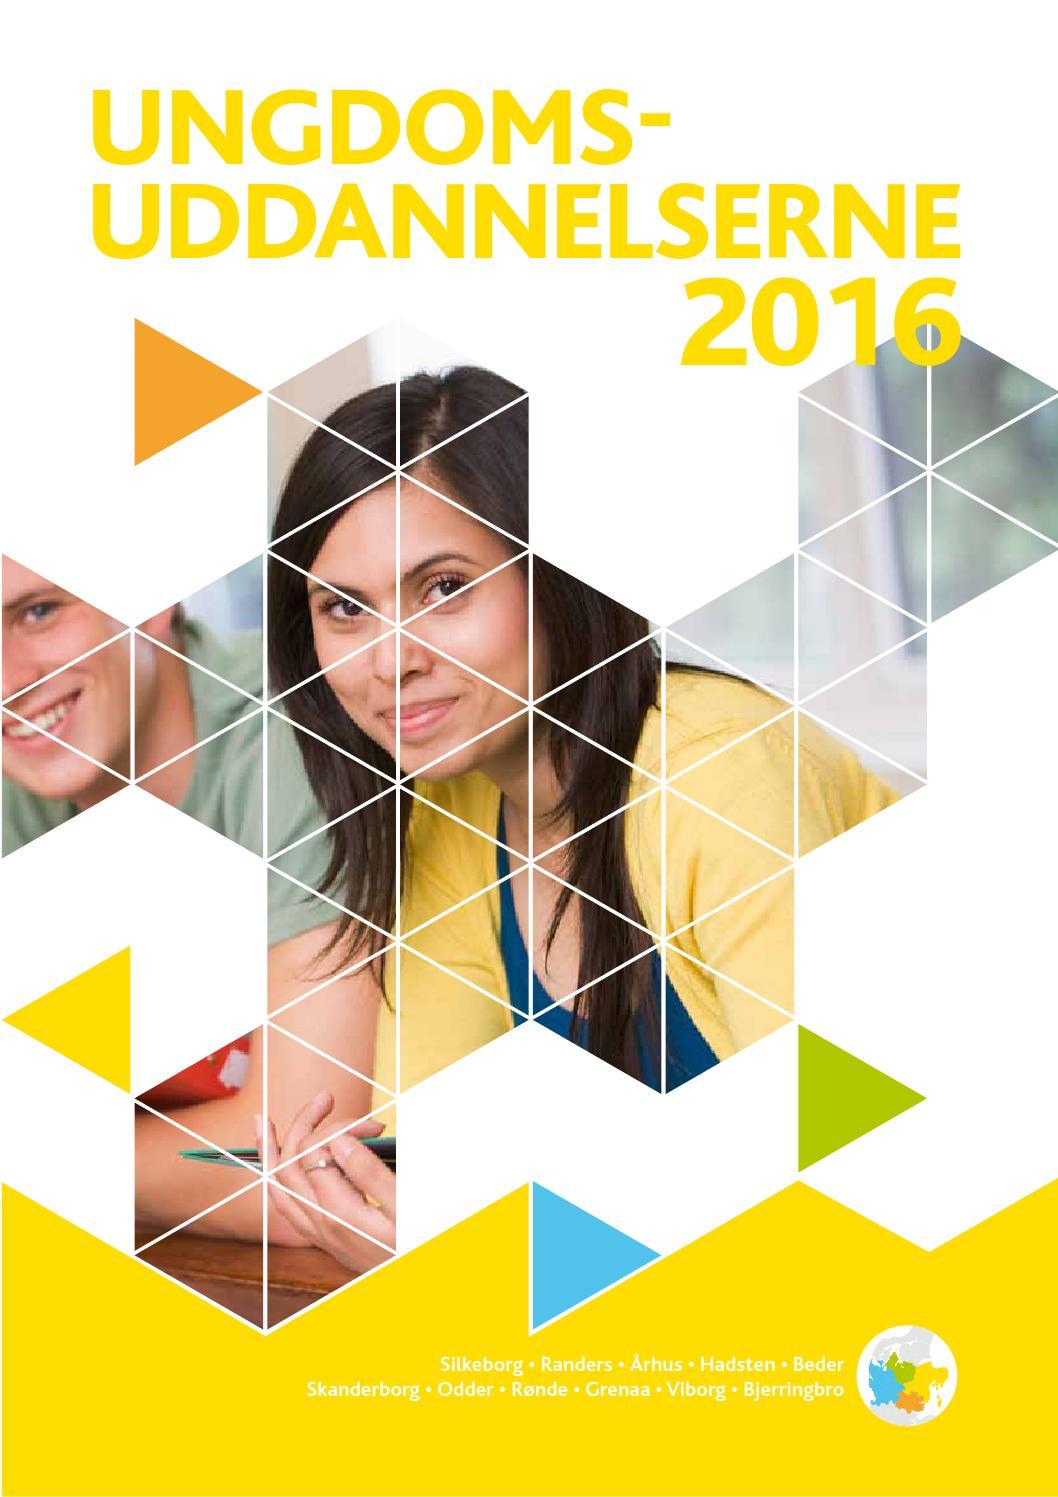 10ac743121c8 Aarhus - Ungdomsuddannelserne 2016 by Jesper Dudal - issuu